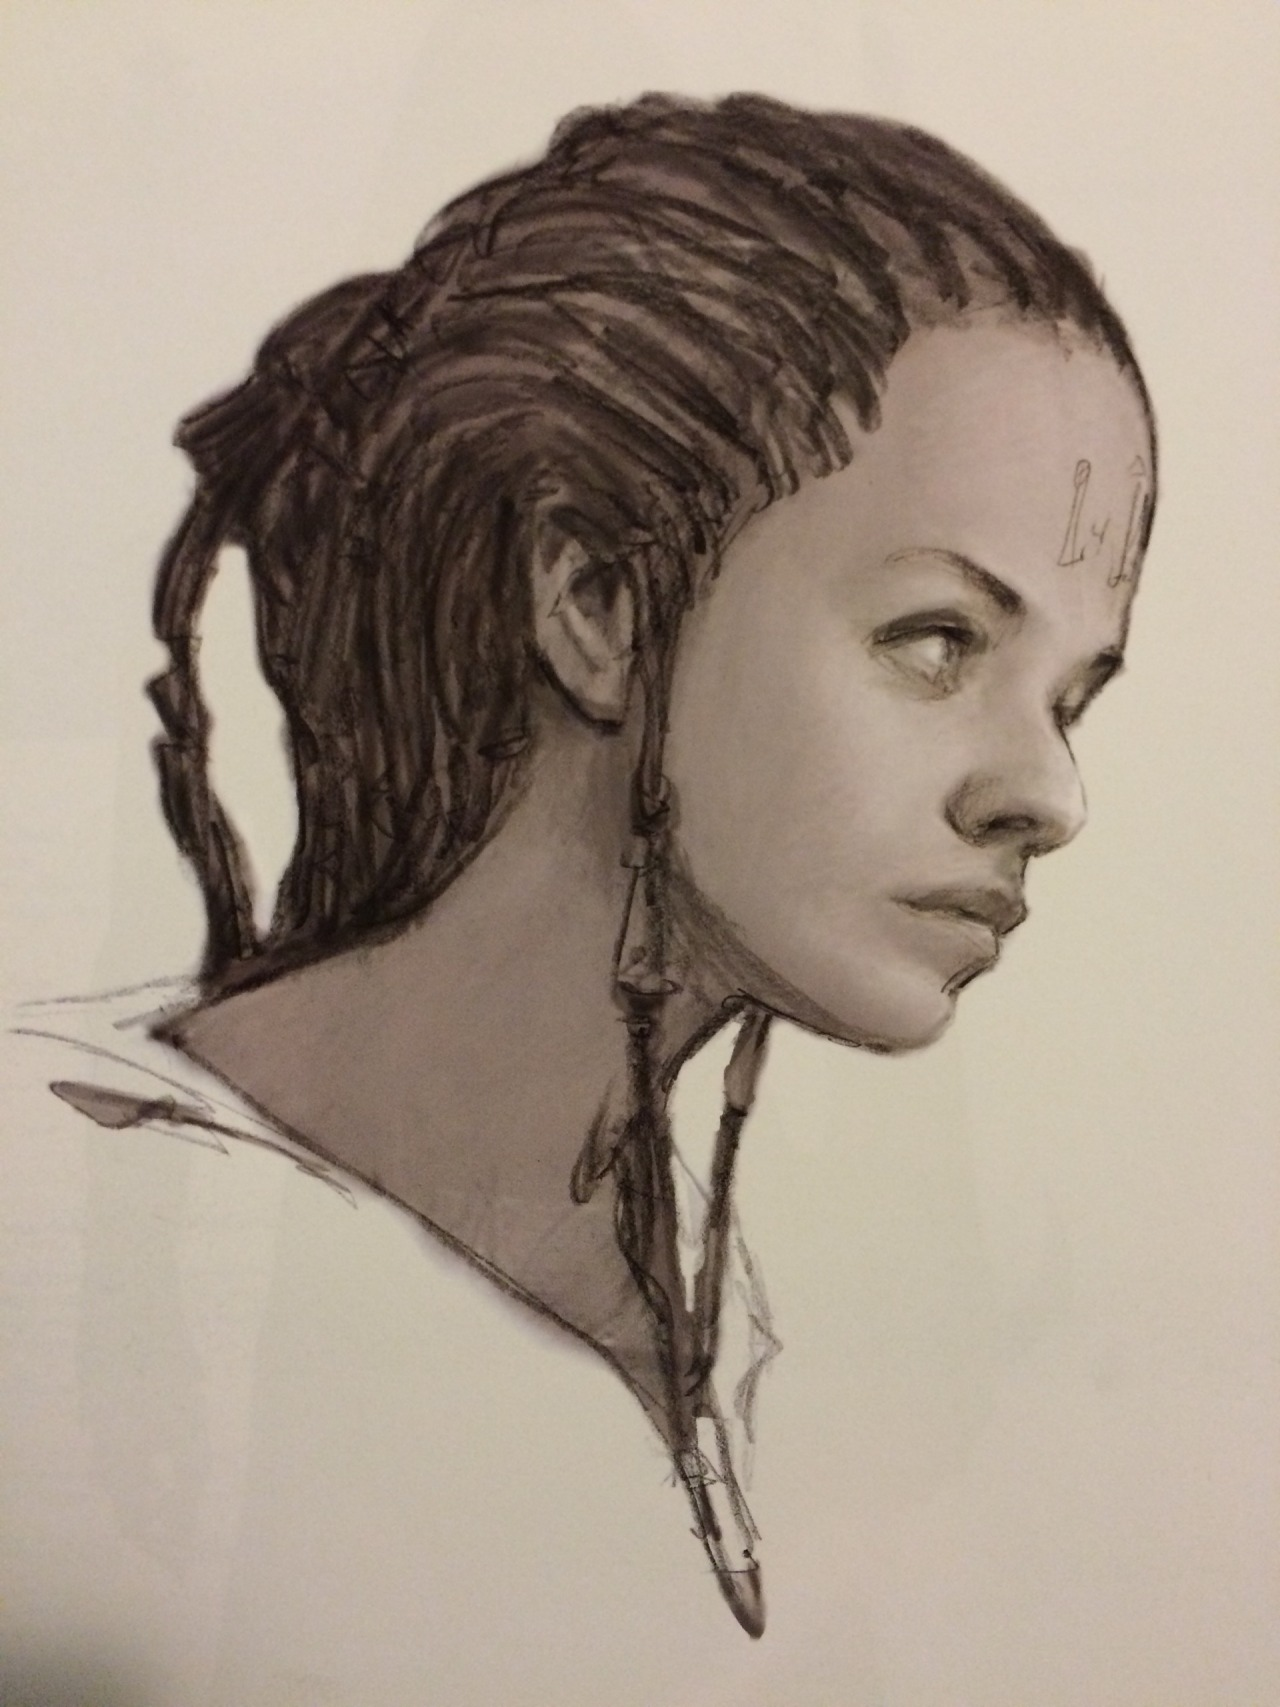 ARCHIVE: Rey's Lineage Discussion II - 2 - Page 3 Tumblr_o2z5veb4u01v3jt3zo1_1280